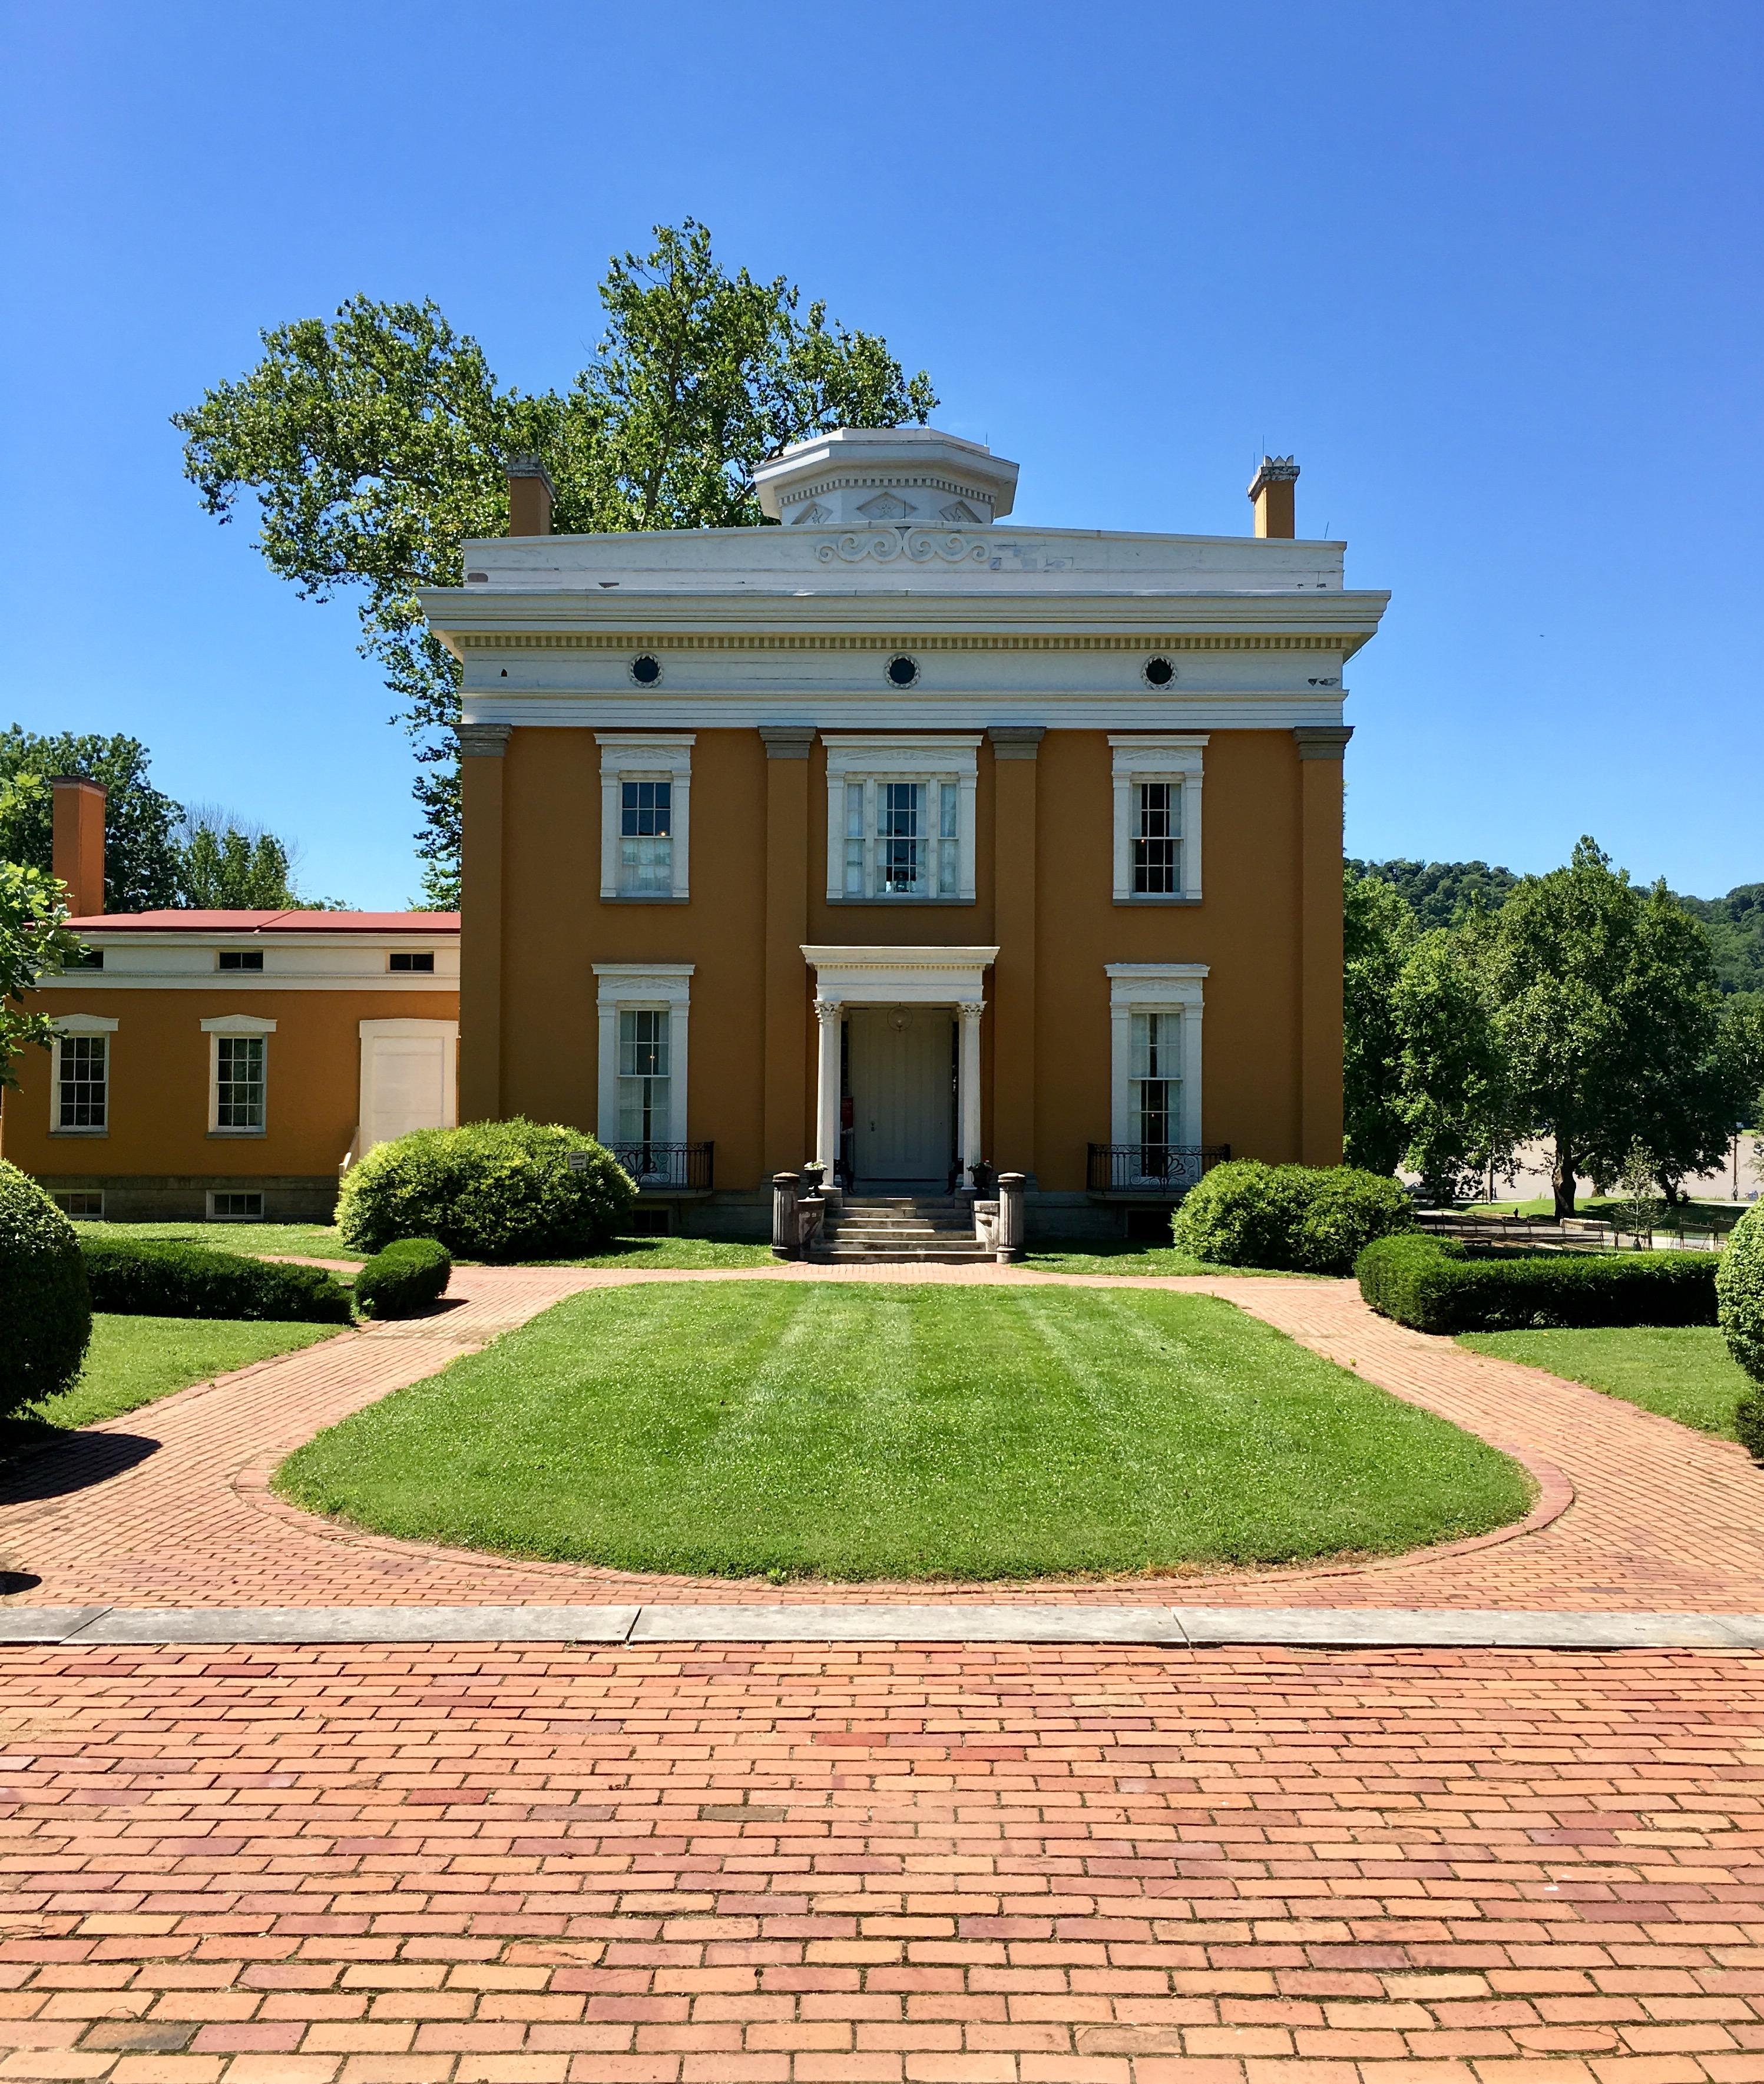 Lanier Mansion - Wikipedia on davis house, haynes house, shady house, johnson house, kendrick house, lutz house, hanson house, the first house, prince house,